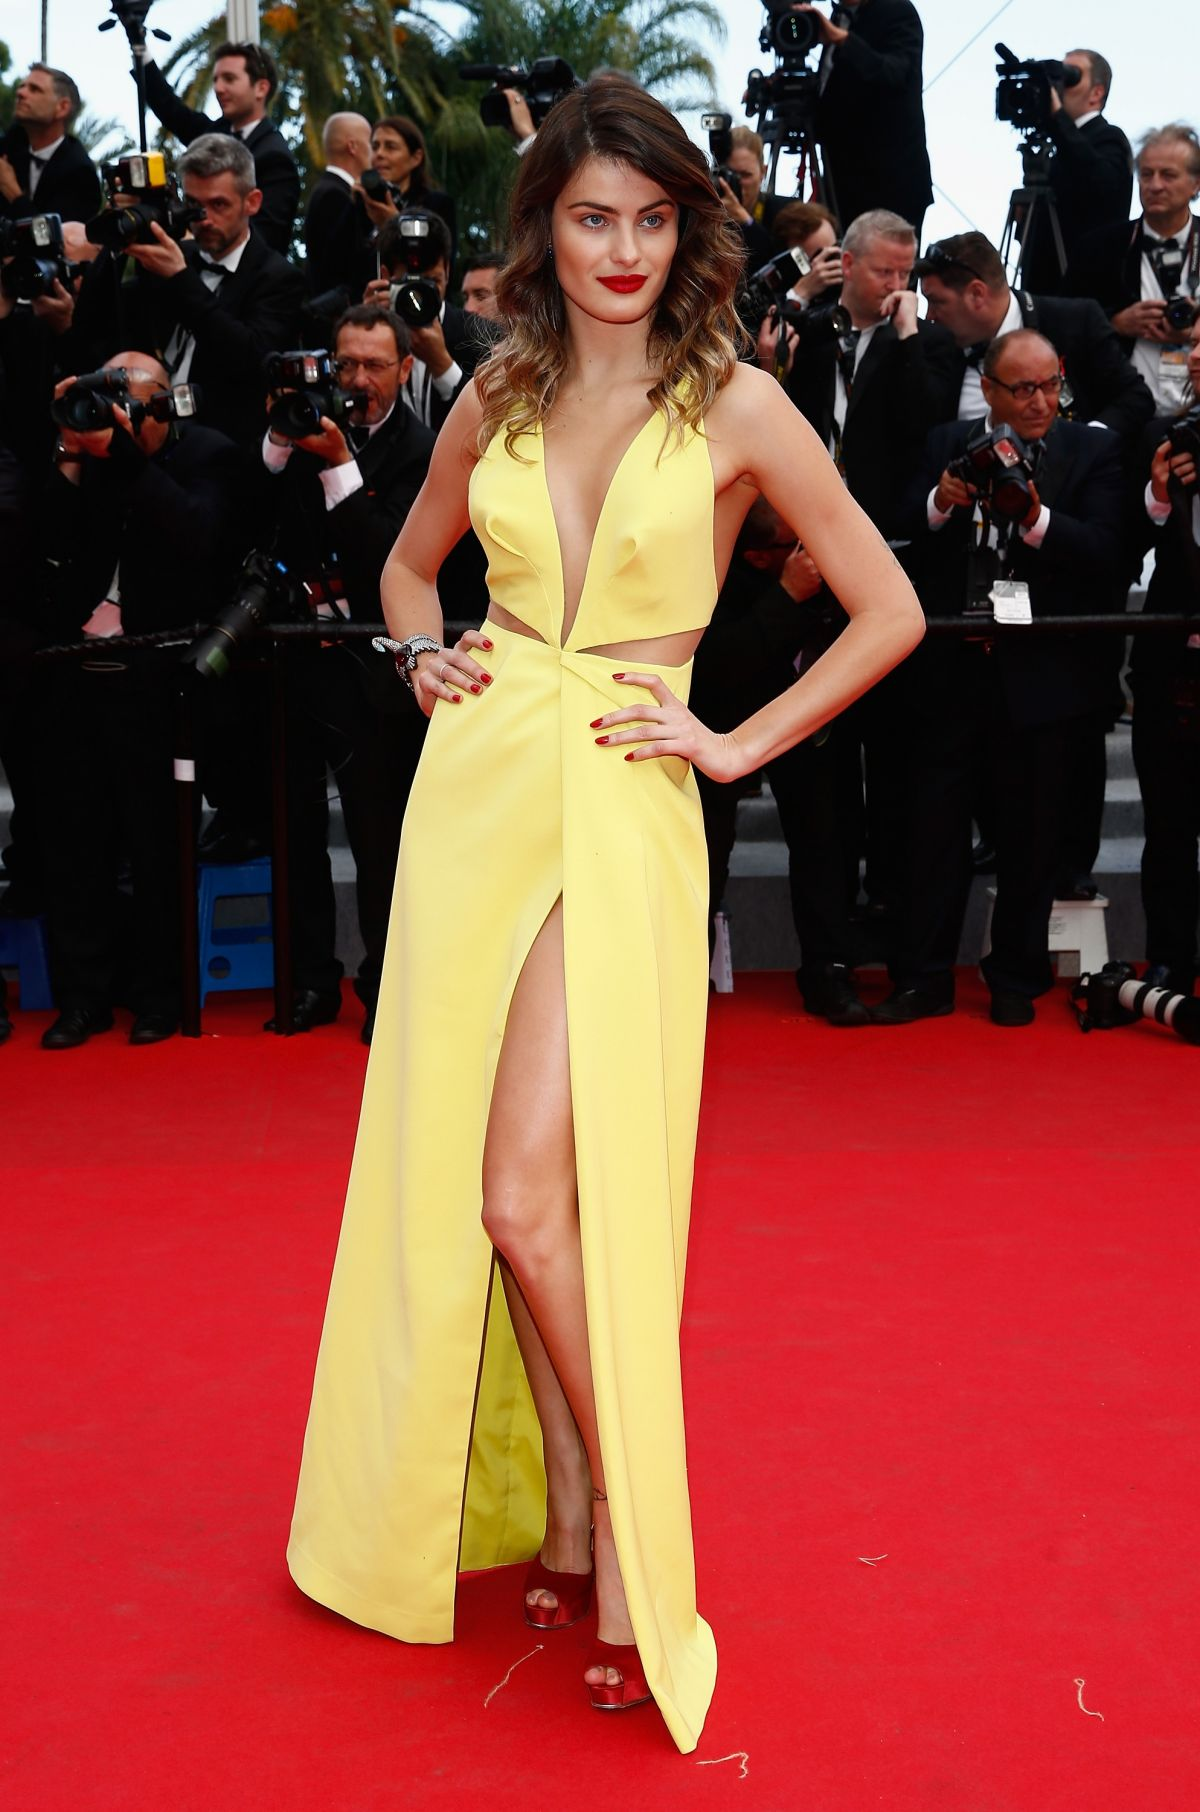 ISABELI FONTANA at Saint Laurent Premiee at Cannes Film Festival